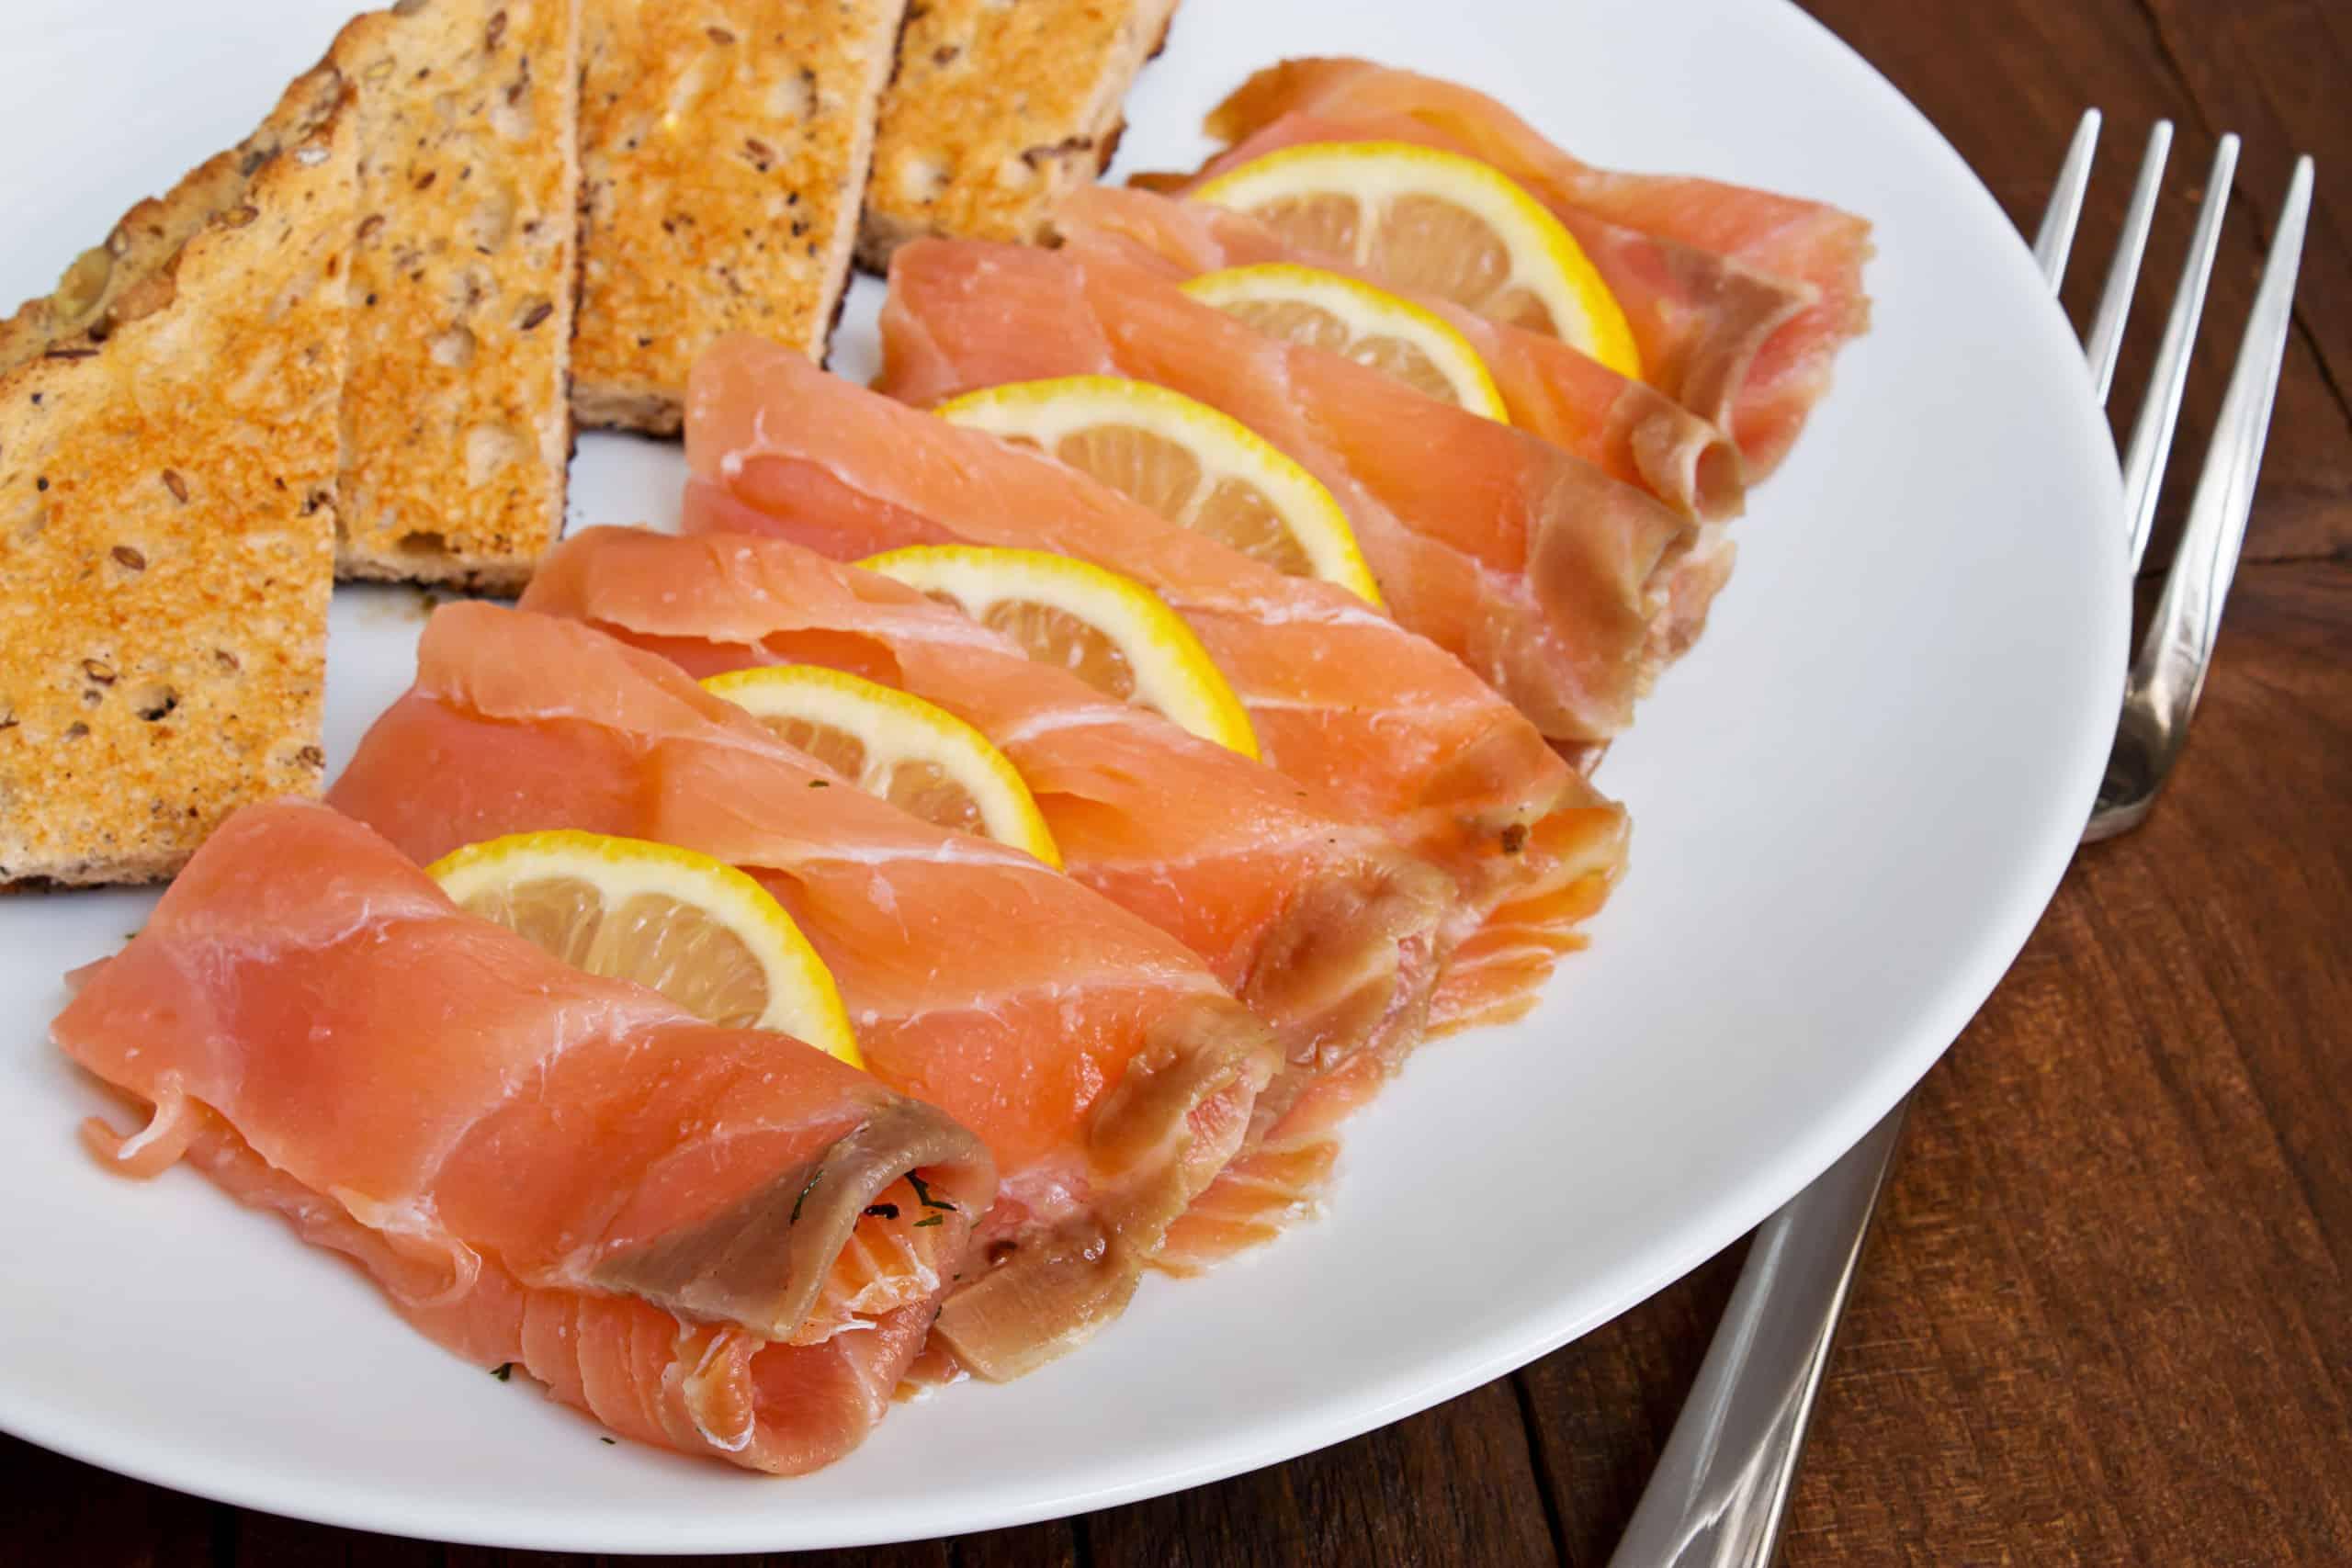 Swedish Cuisine